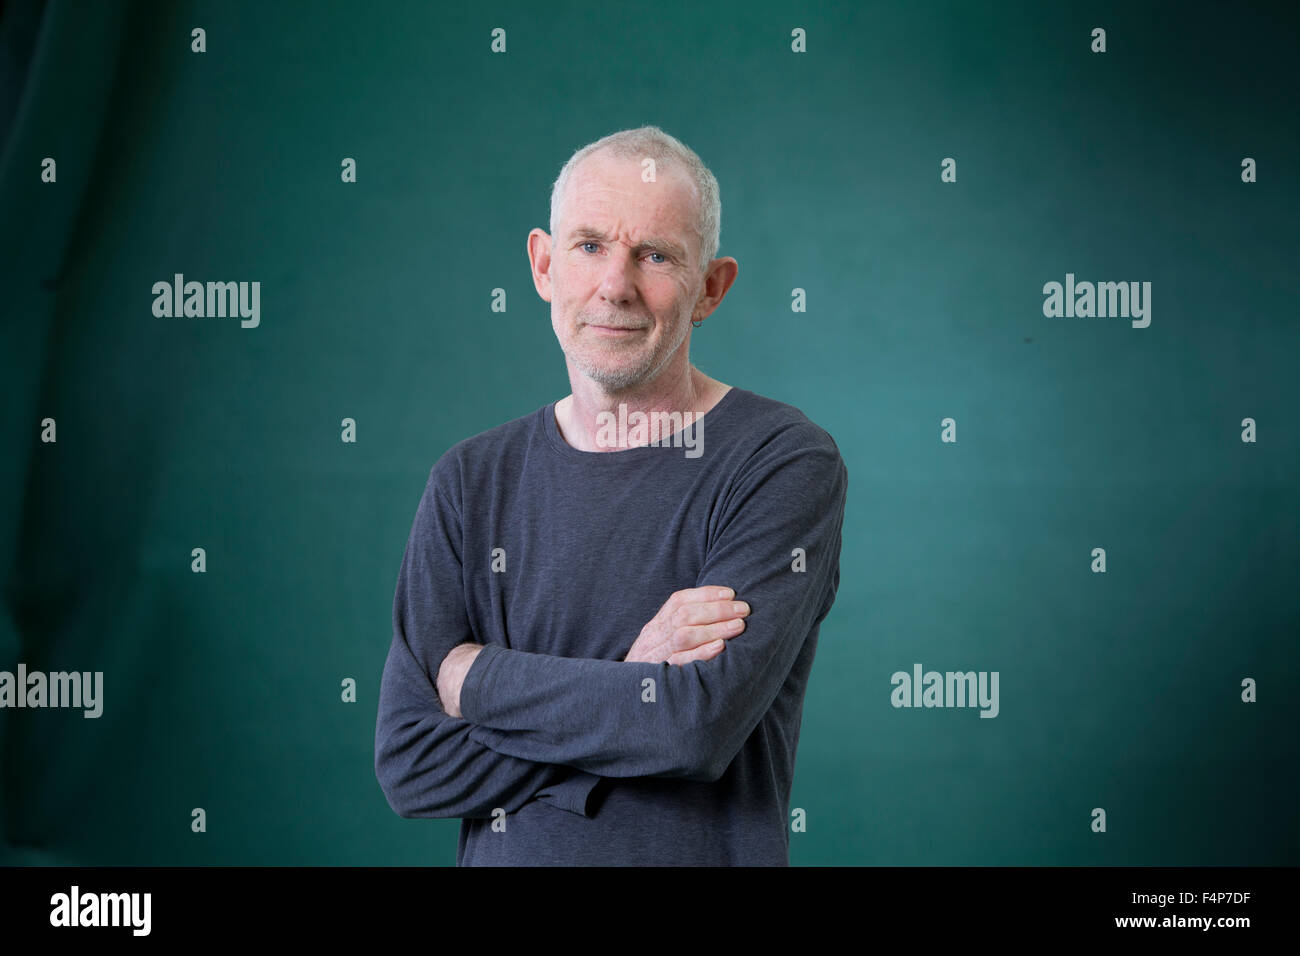 Ian Stephen, Scottish poet and author, at the Edinburgh International Book Festival 2015. Edinburgh. 30th August - Stock Image